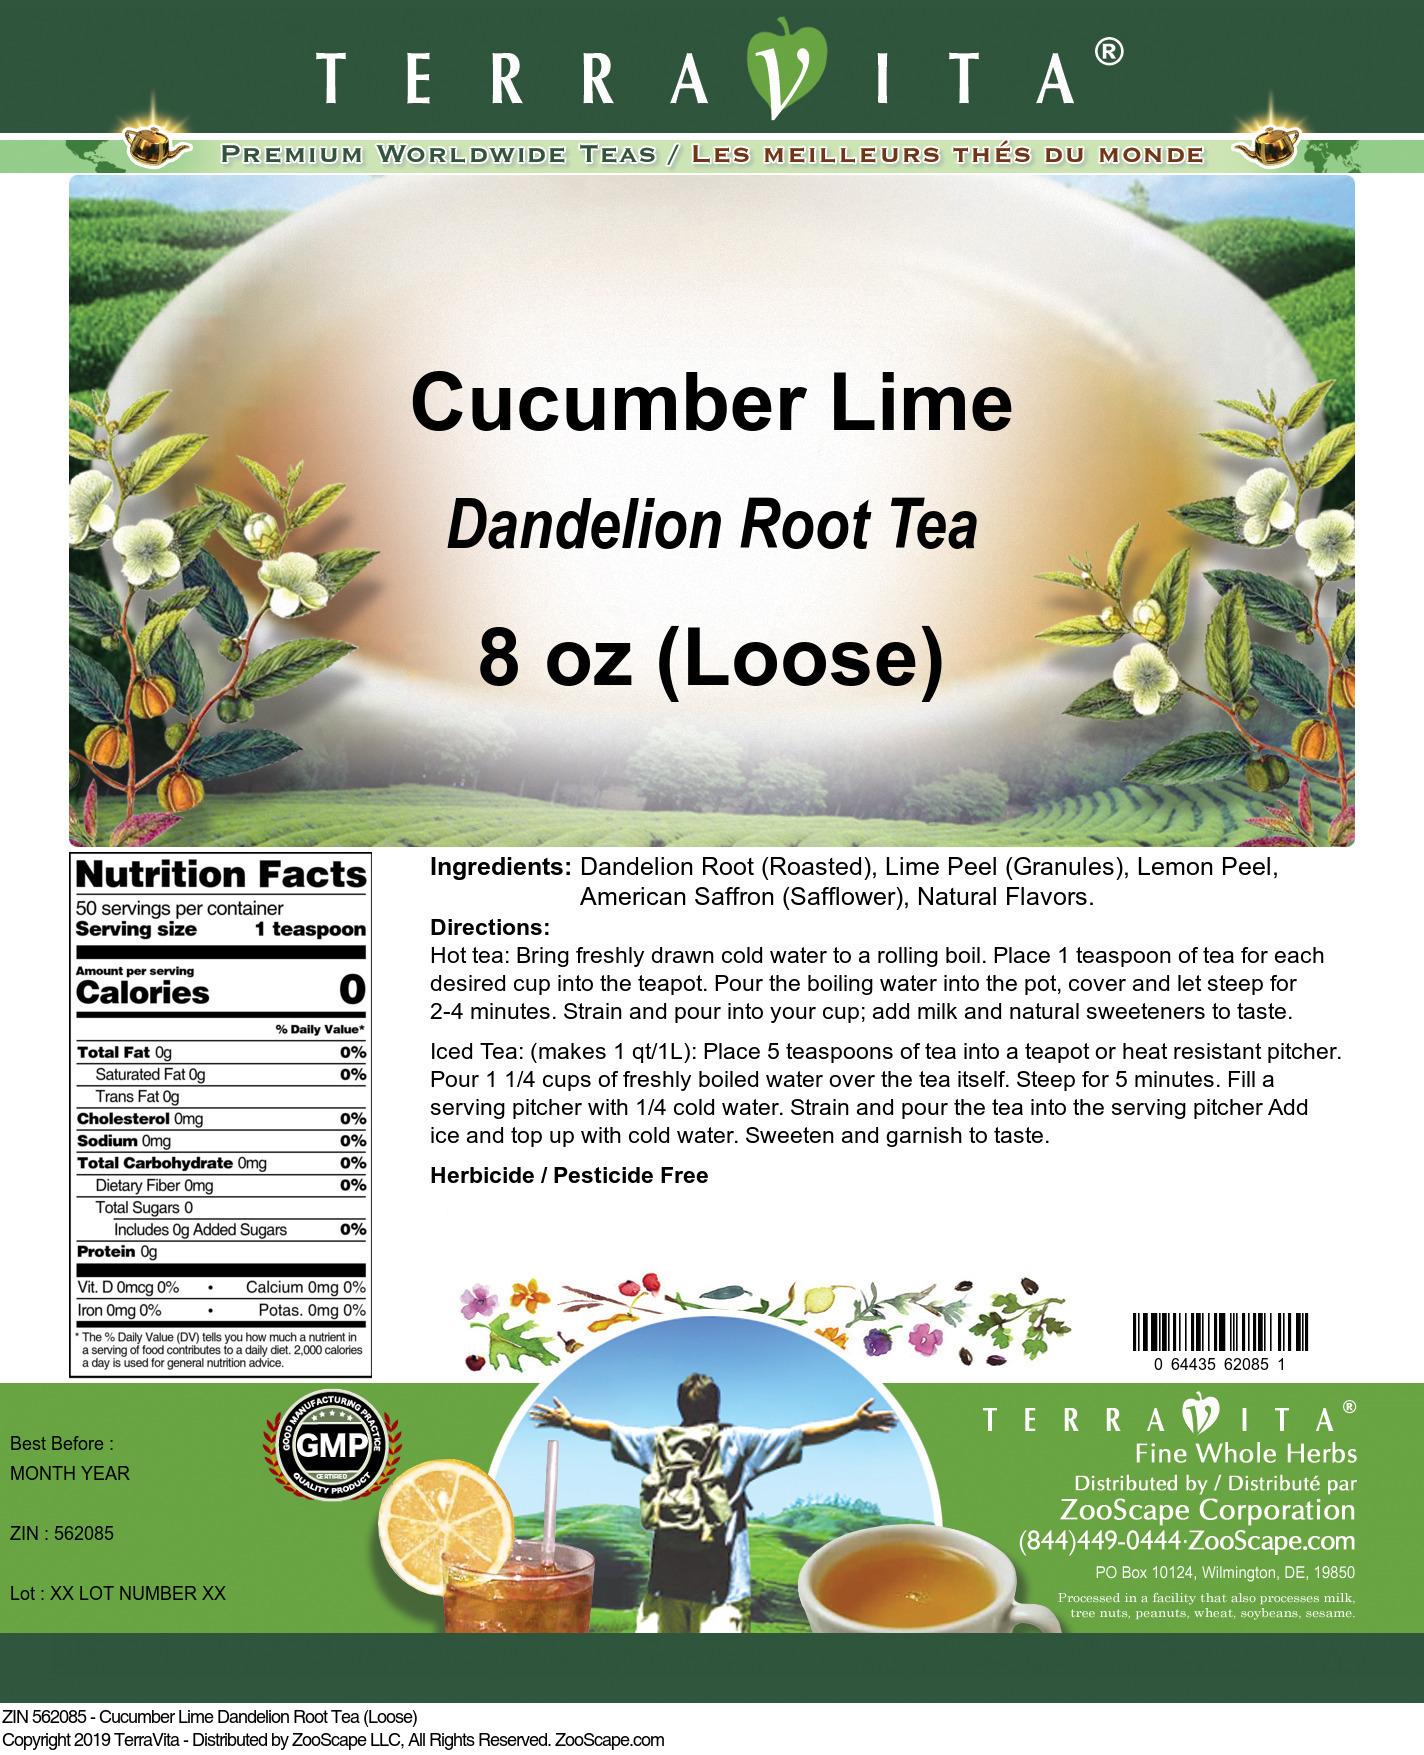 Cucumber Lime Dandelion Root Tea (Loose)